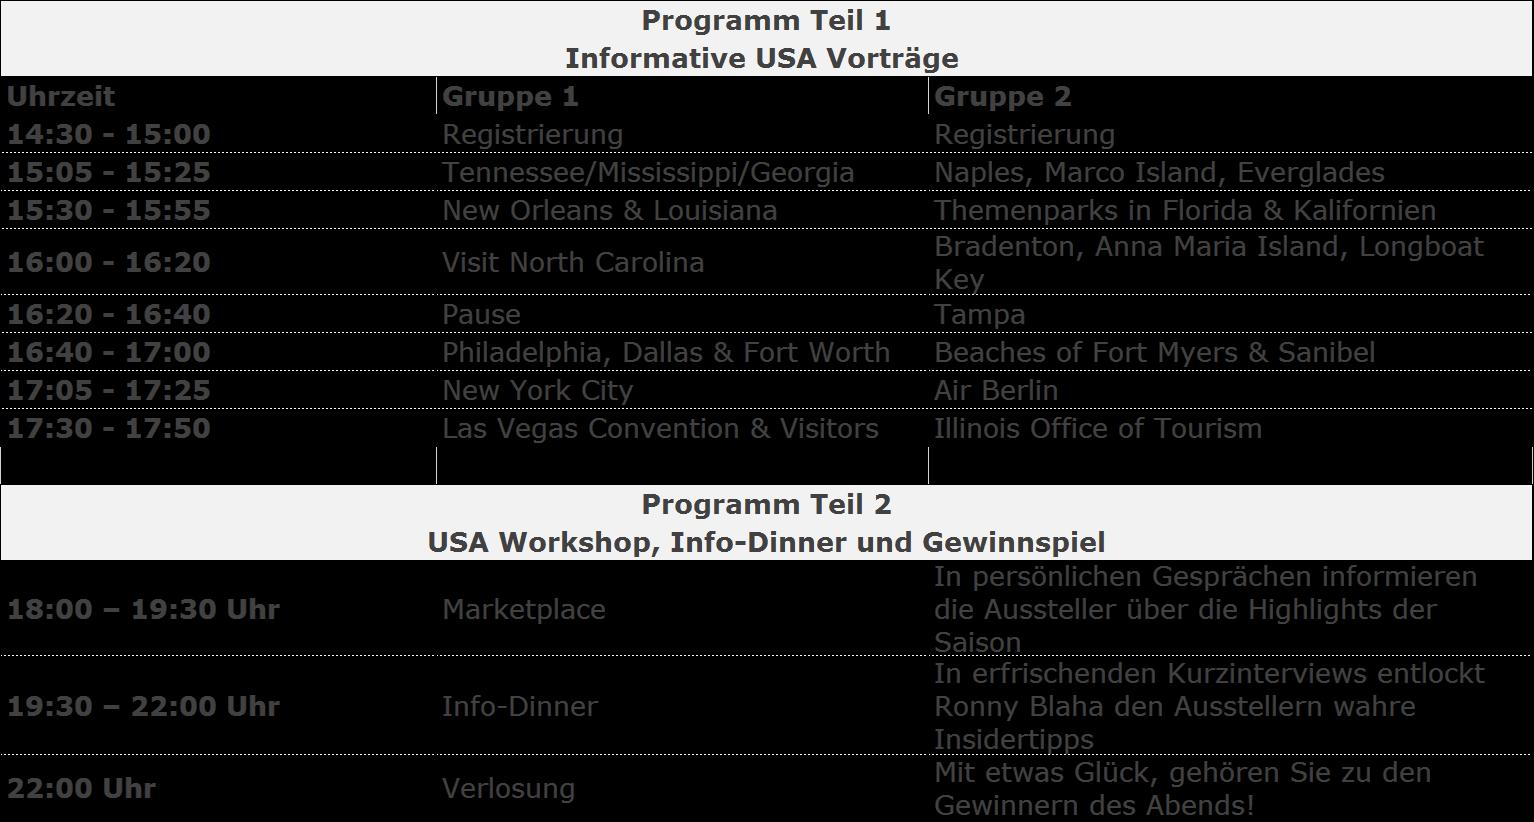 Seminar programm Visit USA